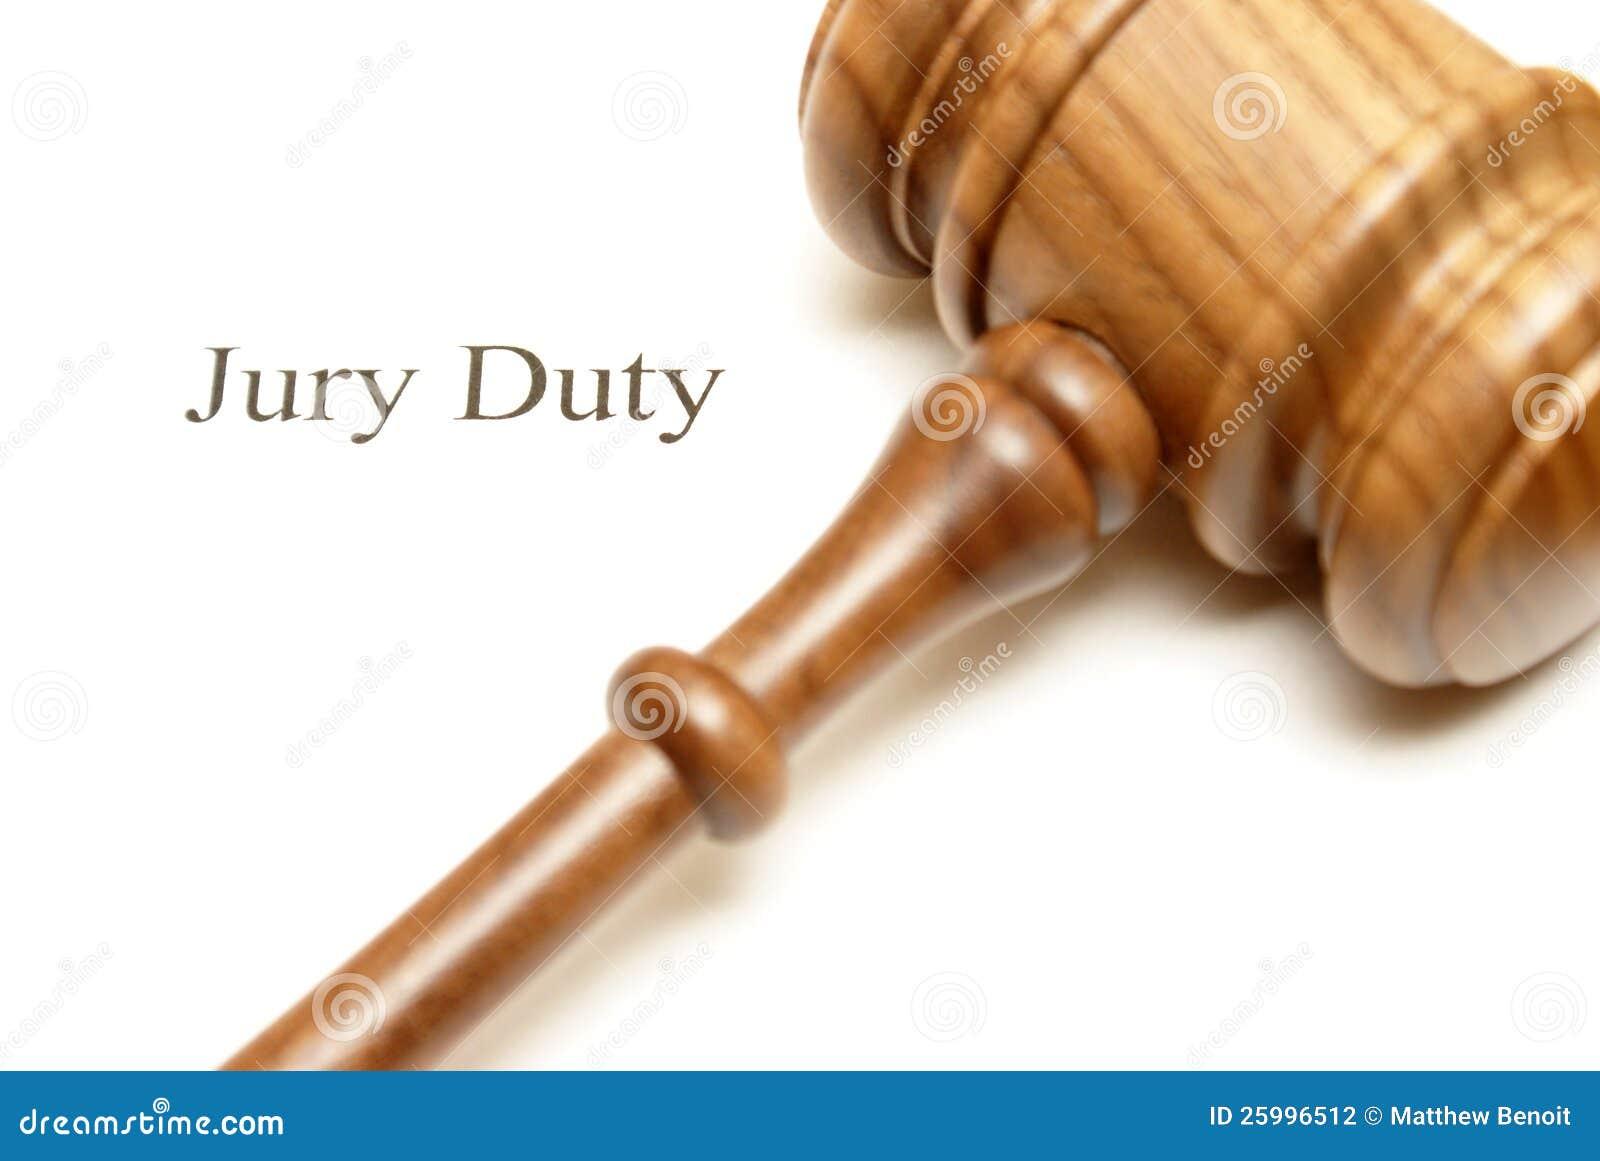 jury duty stock photography image 25996512 sunset clip art religious sunset clip art gallery